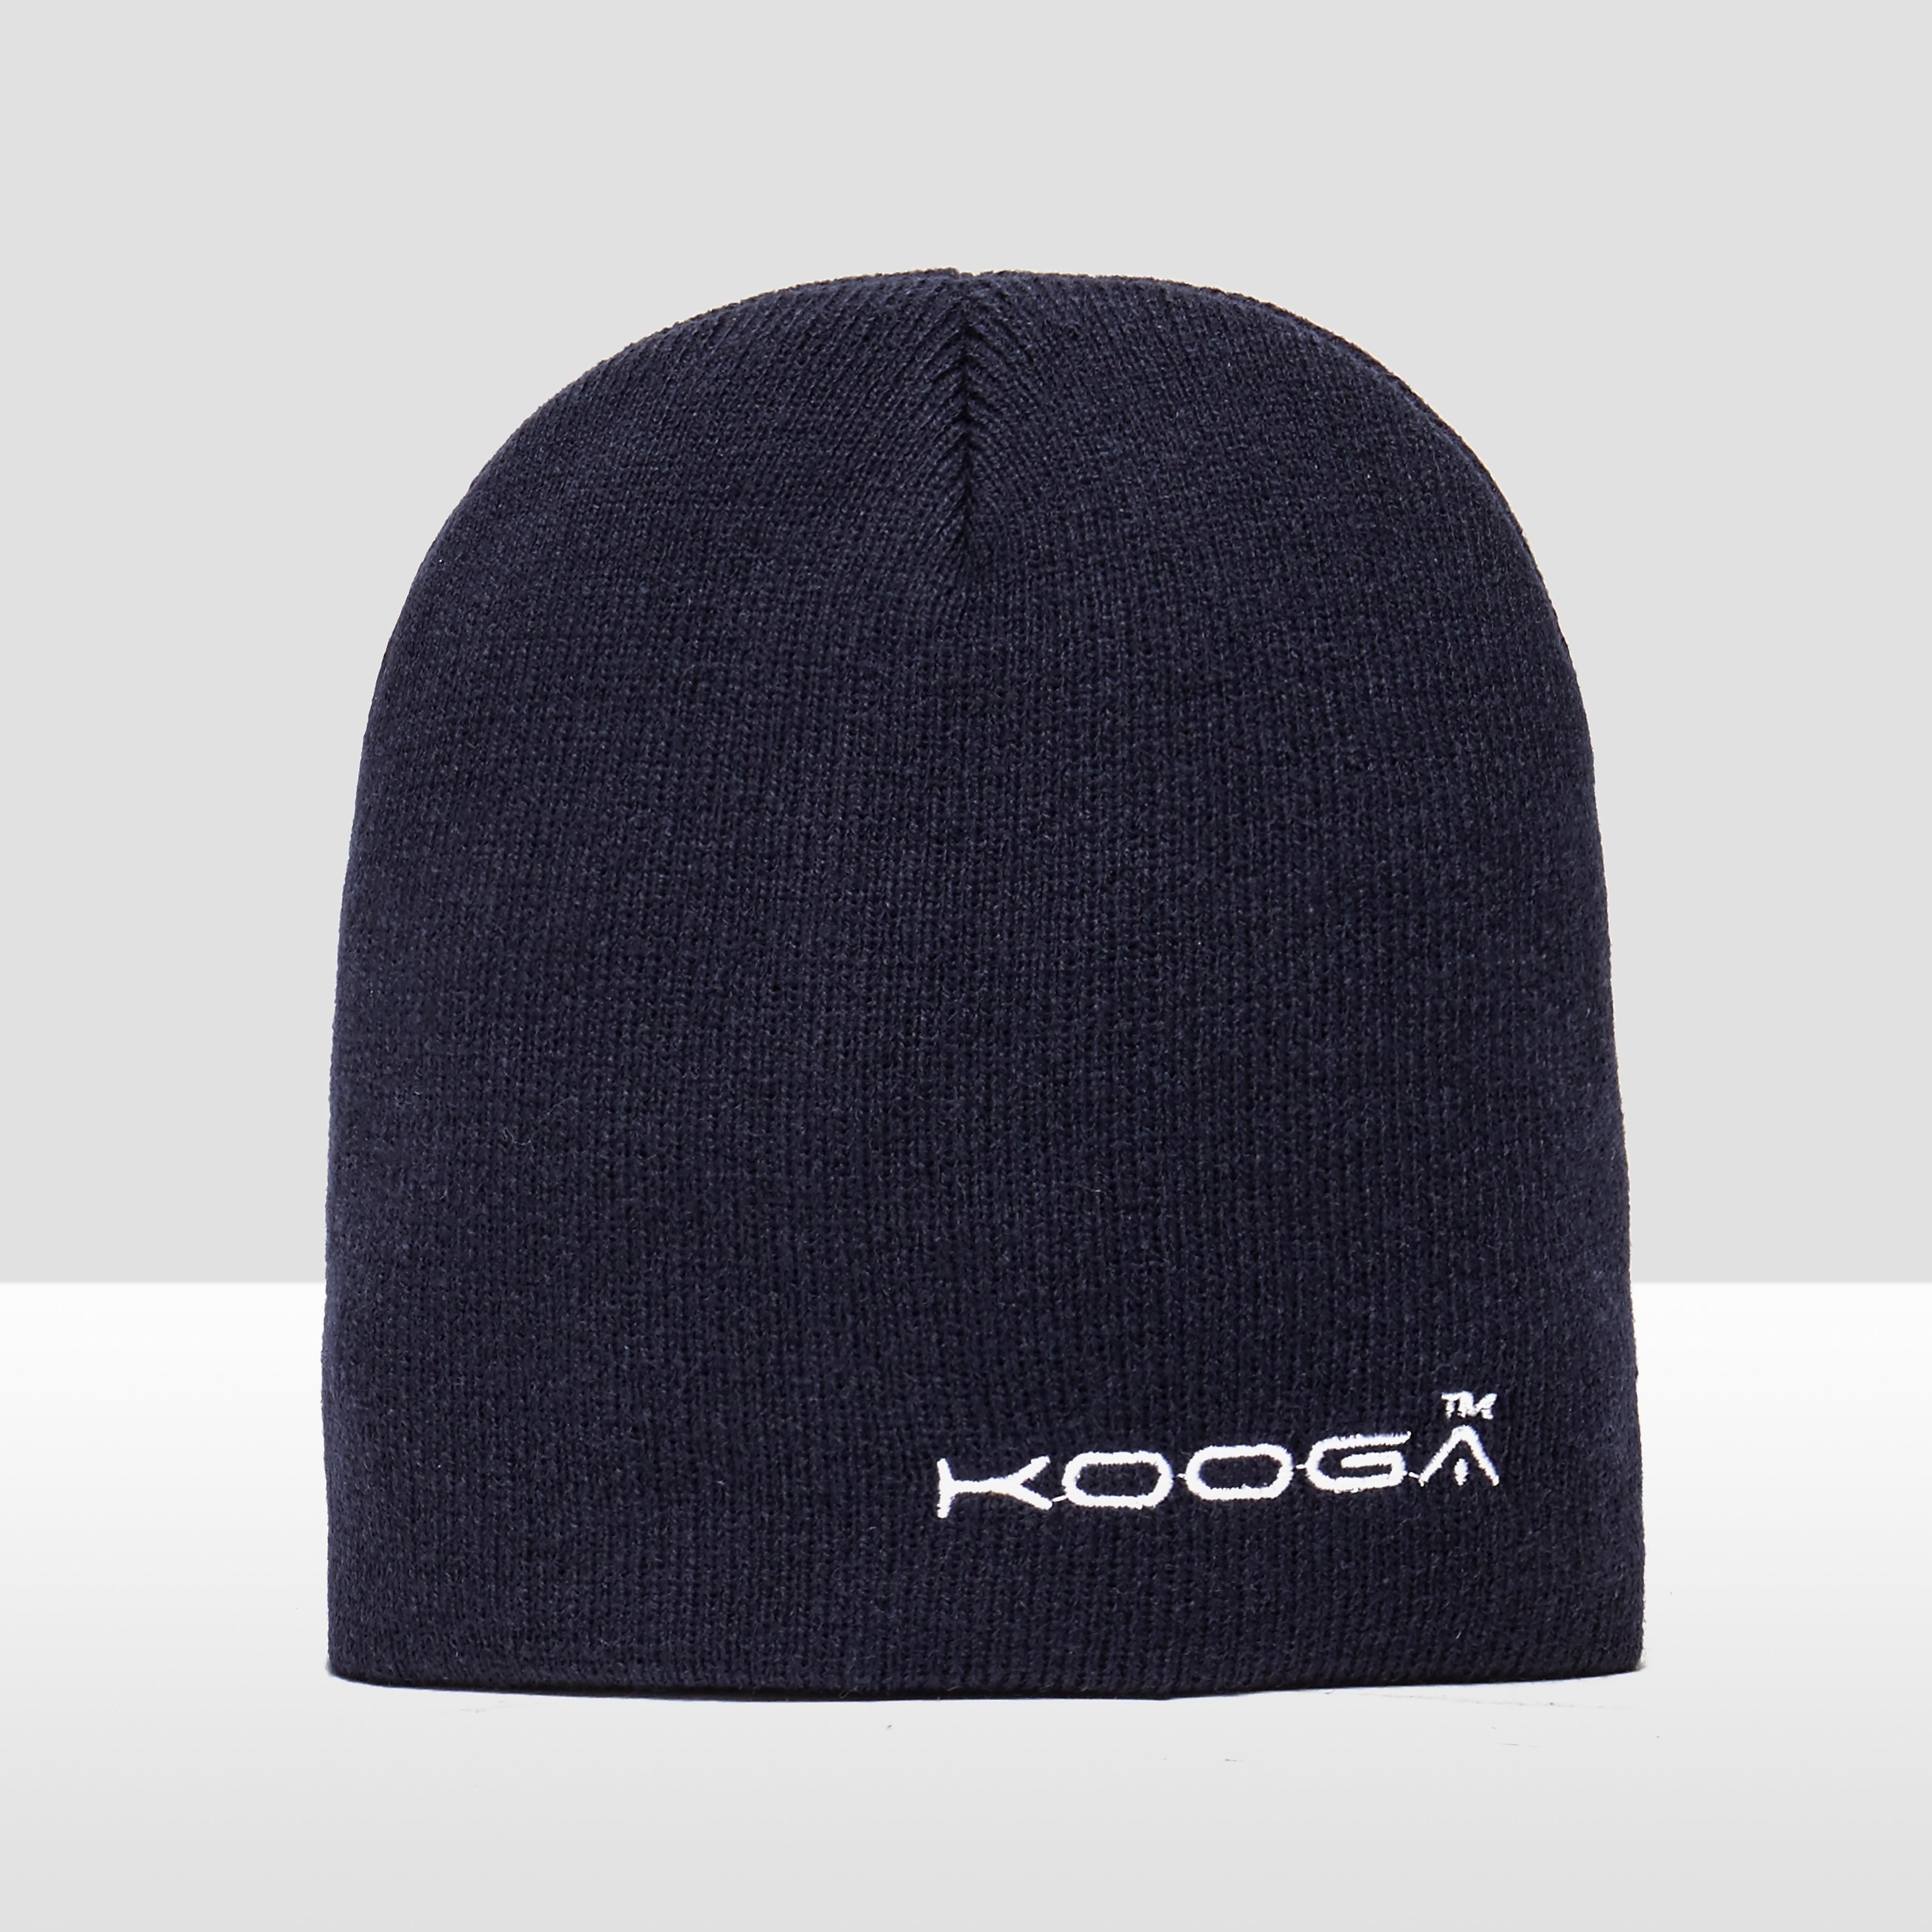 KooGa Club Beanie